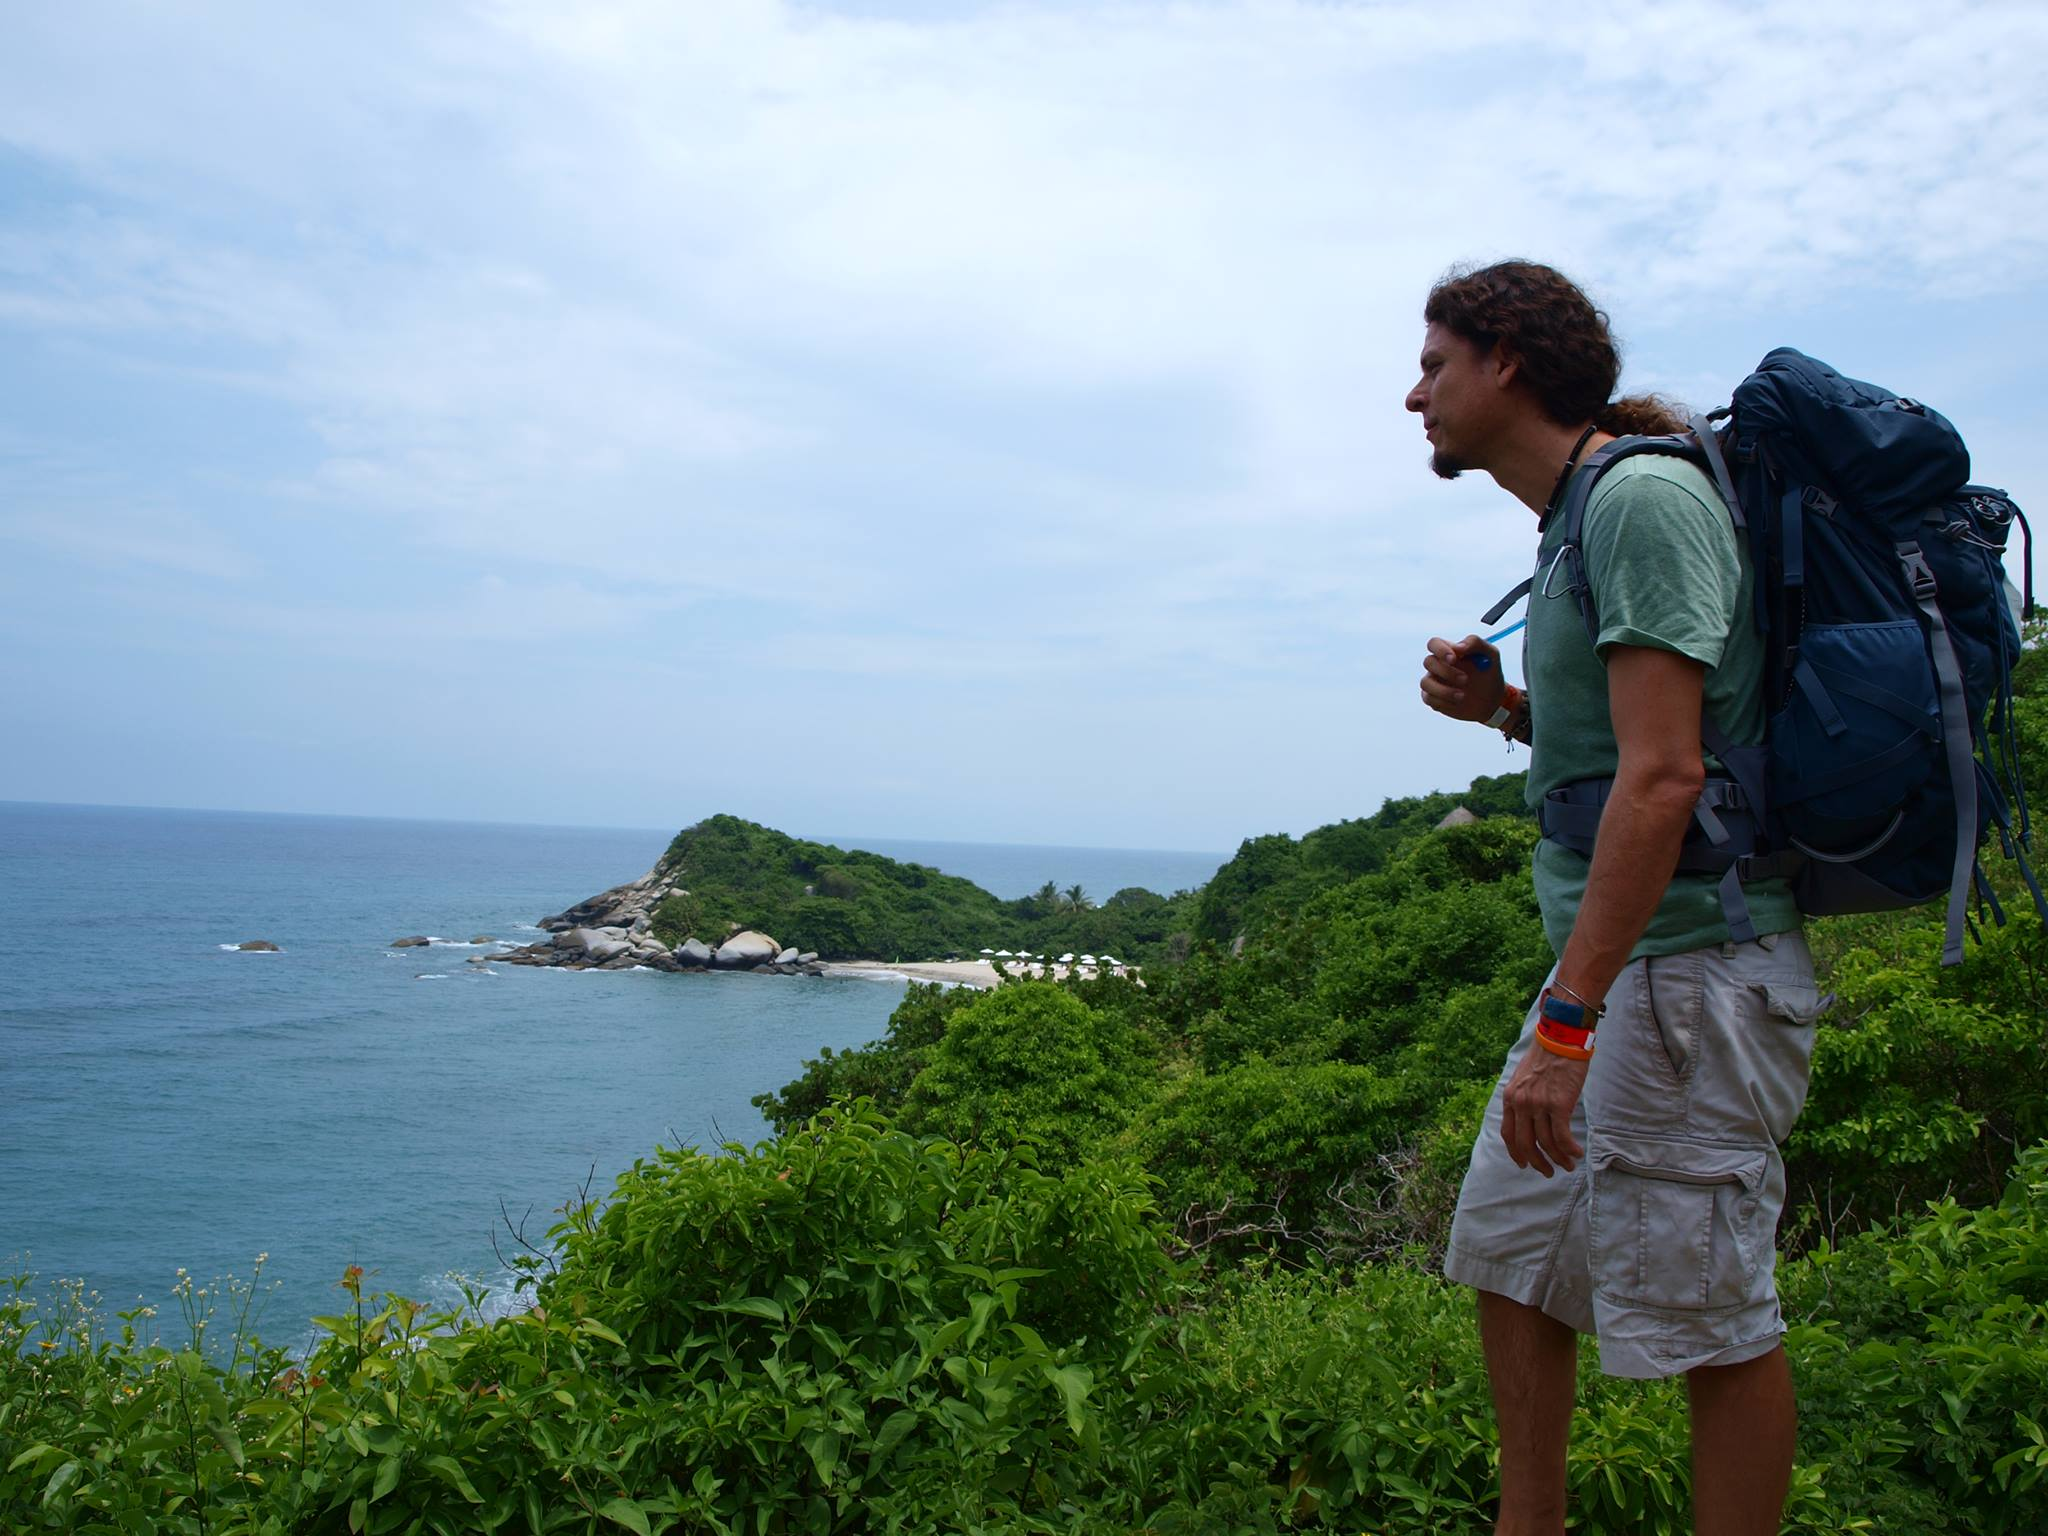 Ricardo Mantilla overlooking the ocean.